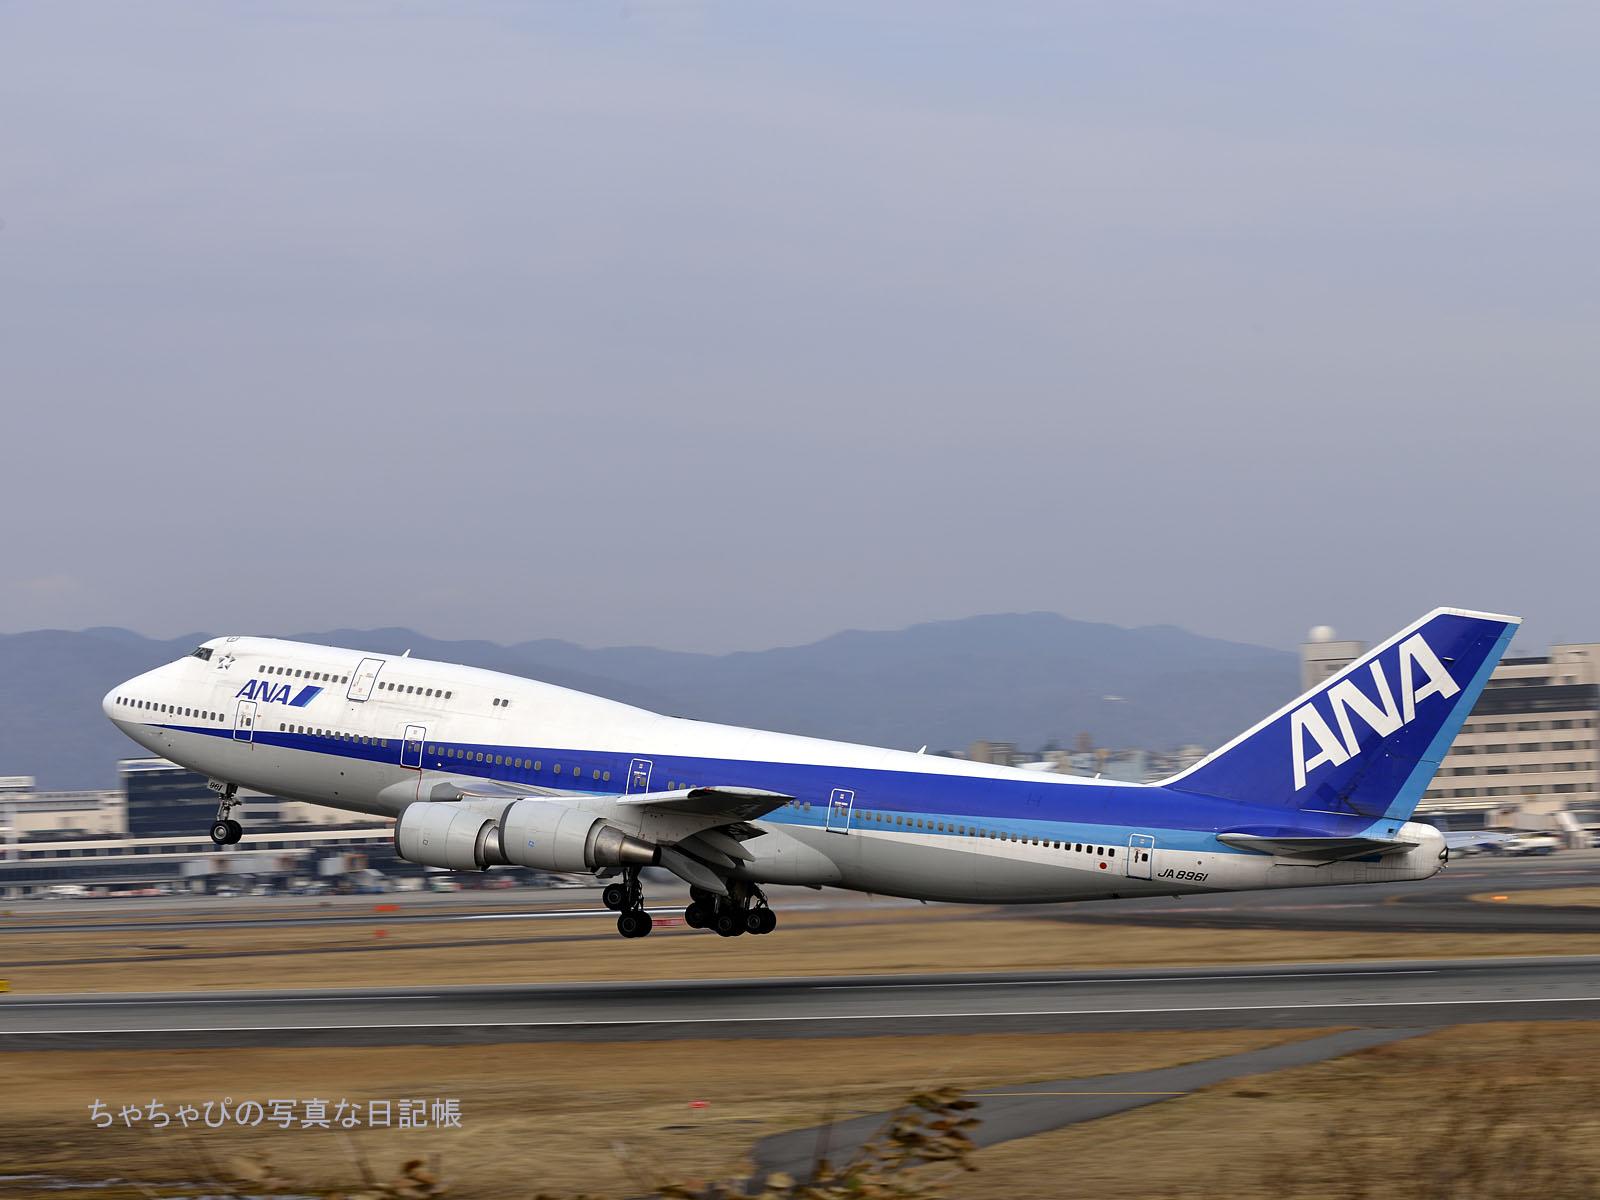 ANA2051 B747-400D JA8961 伊丹遊覧フライト